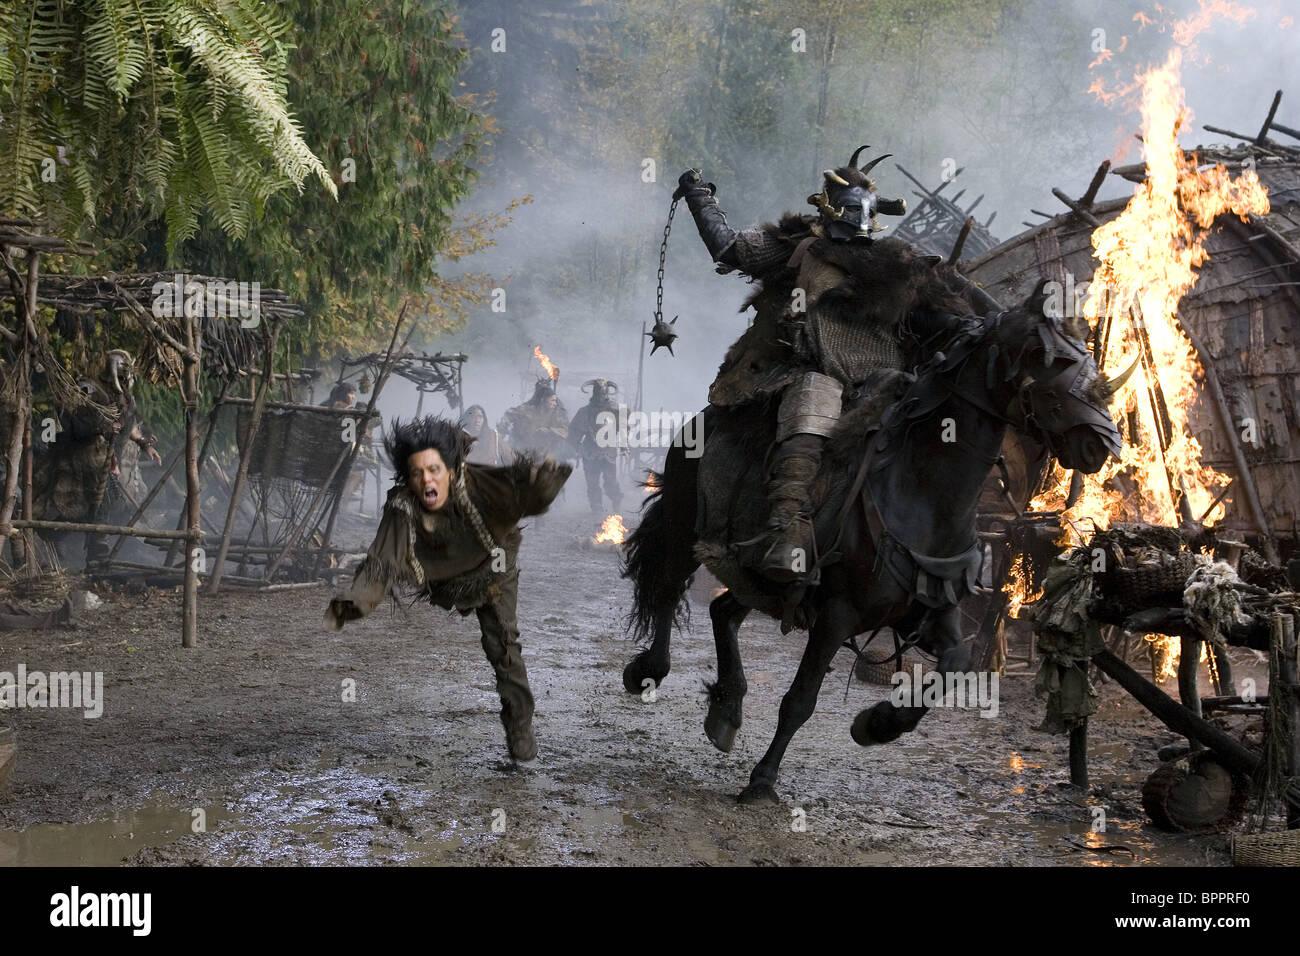 VIKINGS ATTACKS VILLAGERS PATHFINDER (2006) - Stock Image